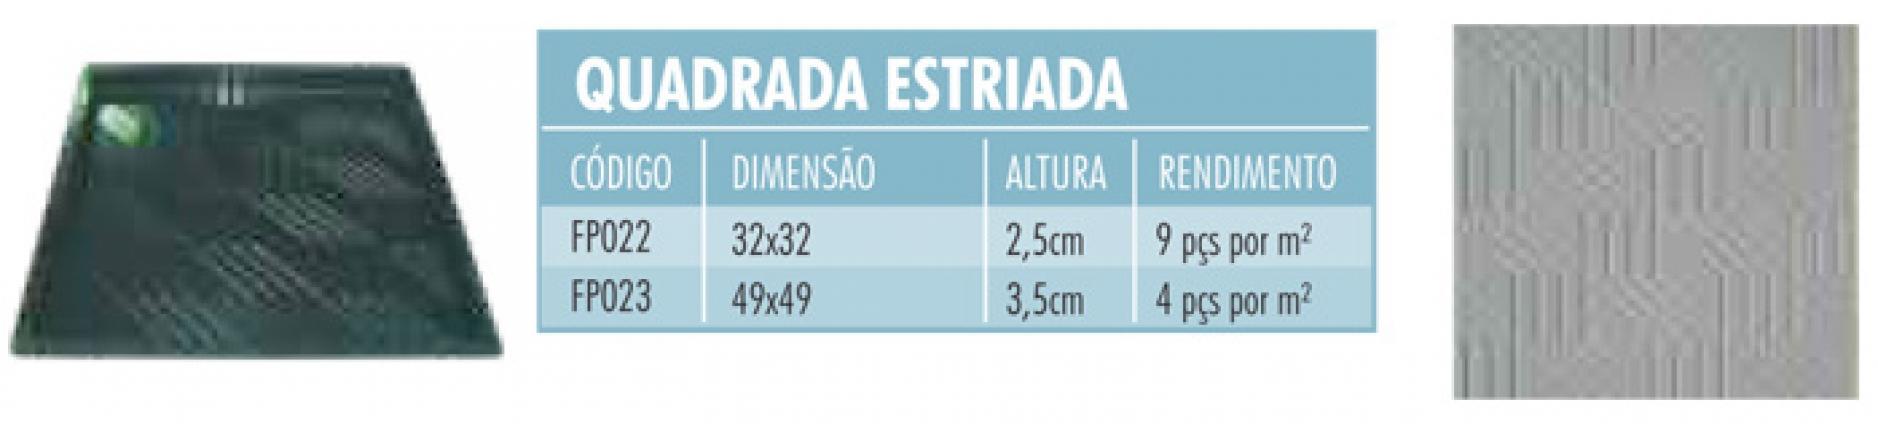 FormasPlasticas-20150313120036.jpg